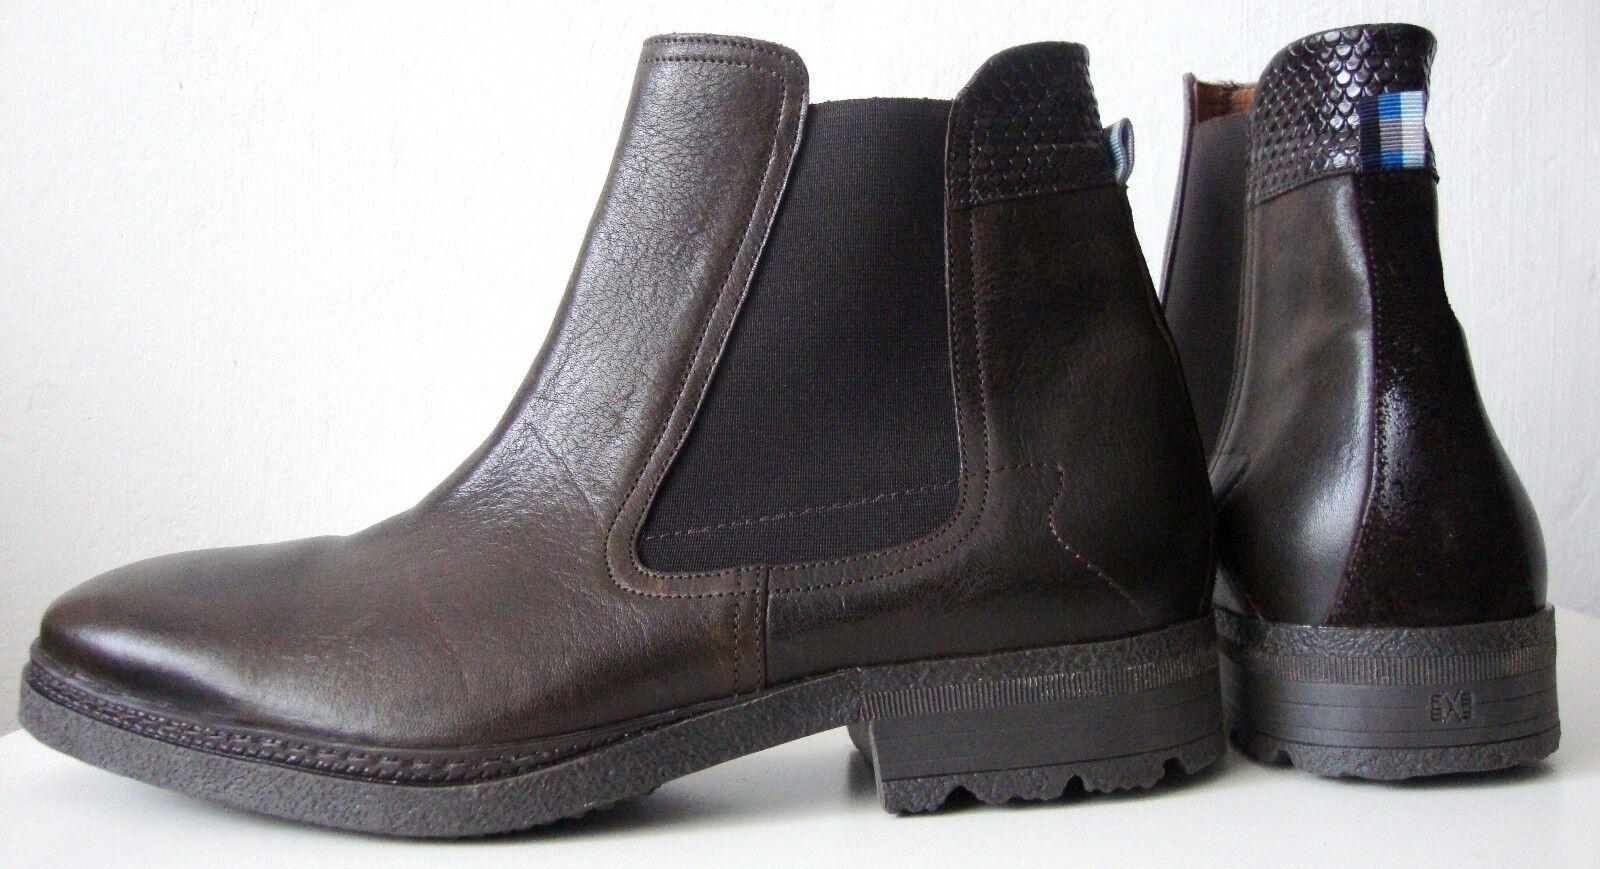 c80f17e1b70984 FLORIS VAN BOMMEL Schuhe Boots Herren Stiefel Stiefelette Schuhe BOMMEL  Halbschuhe Gr.43 NEU 87f5f8